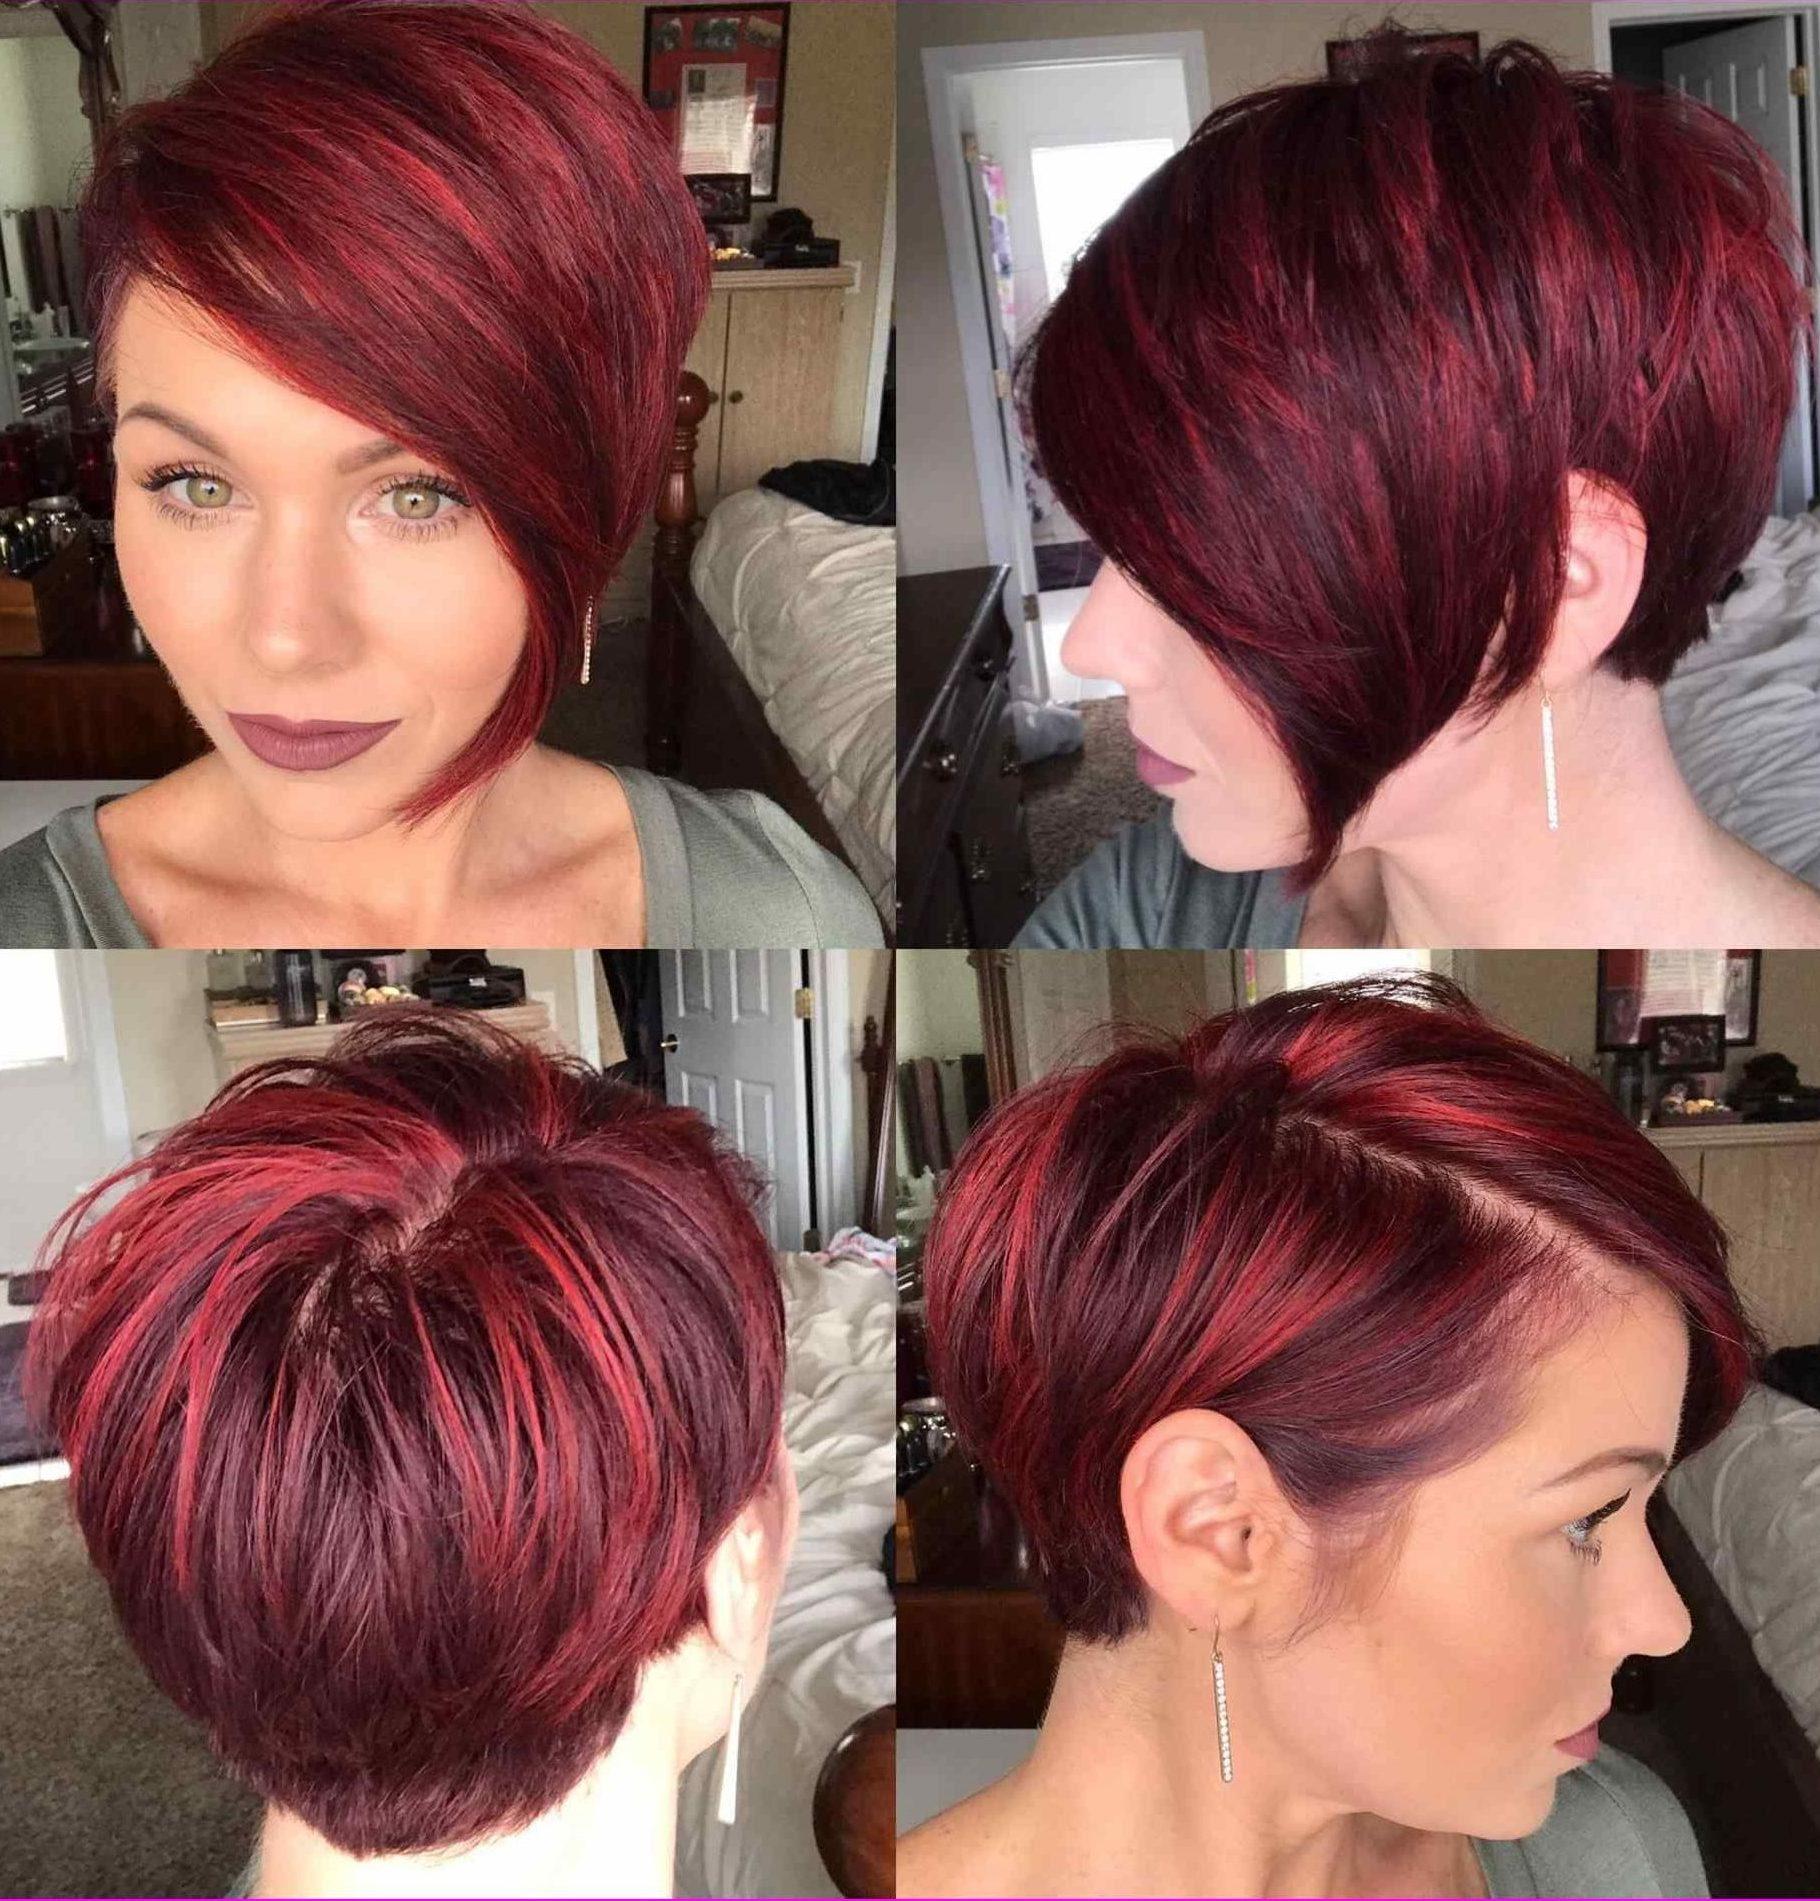 36 Hair Color Ideas for Short Pixie Cuts - Pixie Hair Inspirations - Short  Pixie Cuts